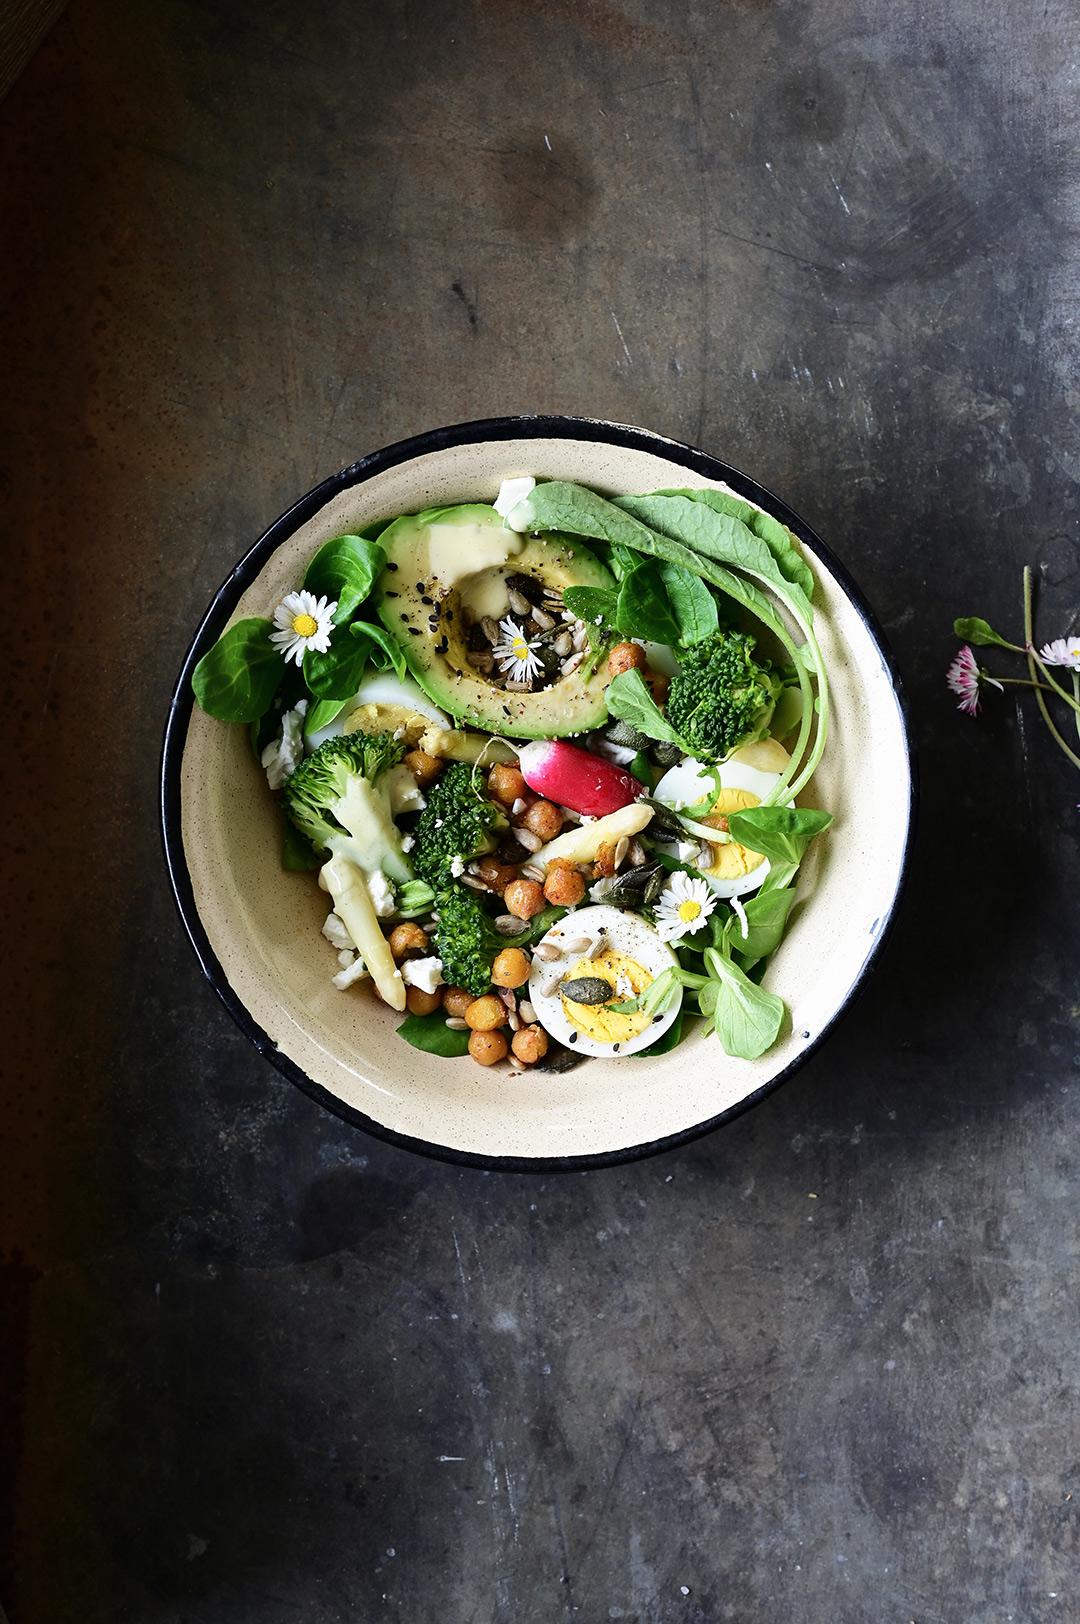 serving dumplings | Asparagus and broccoli spring salad with lemon honey dressing